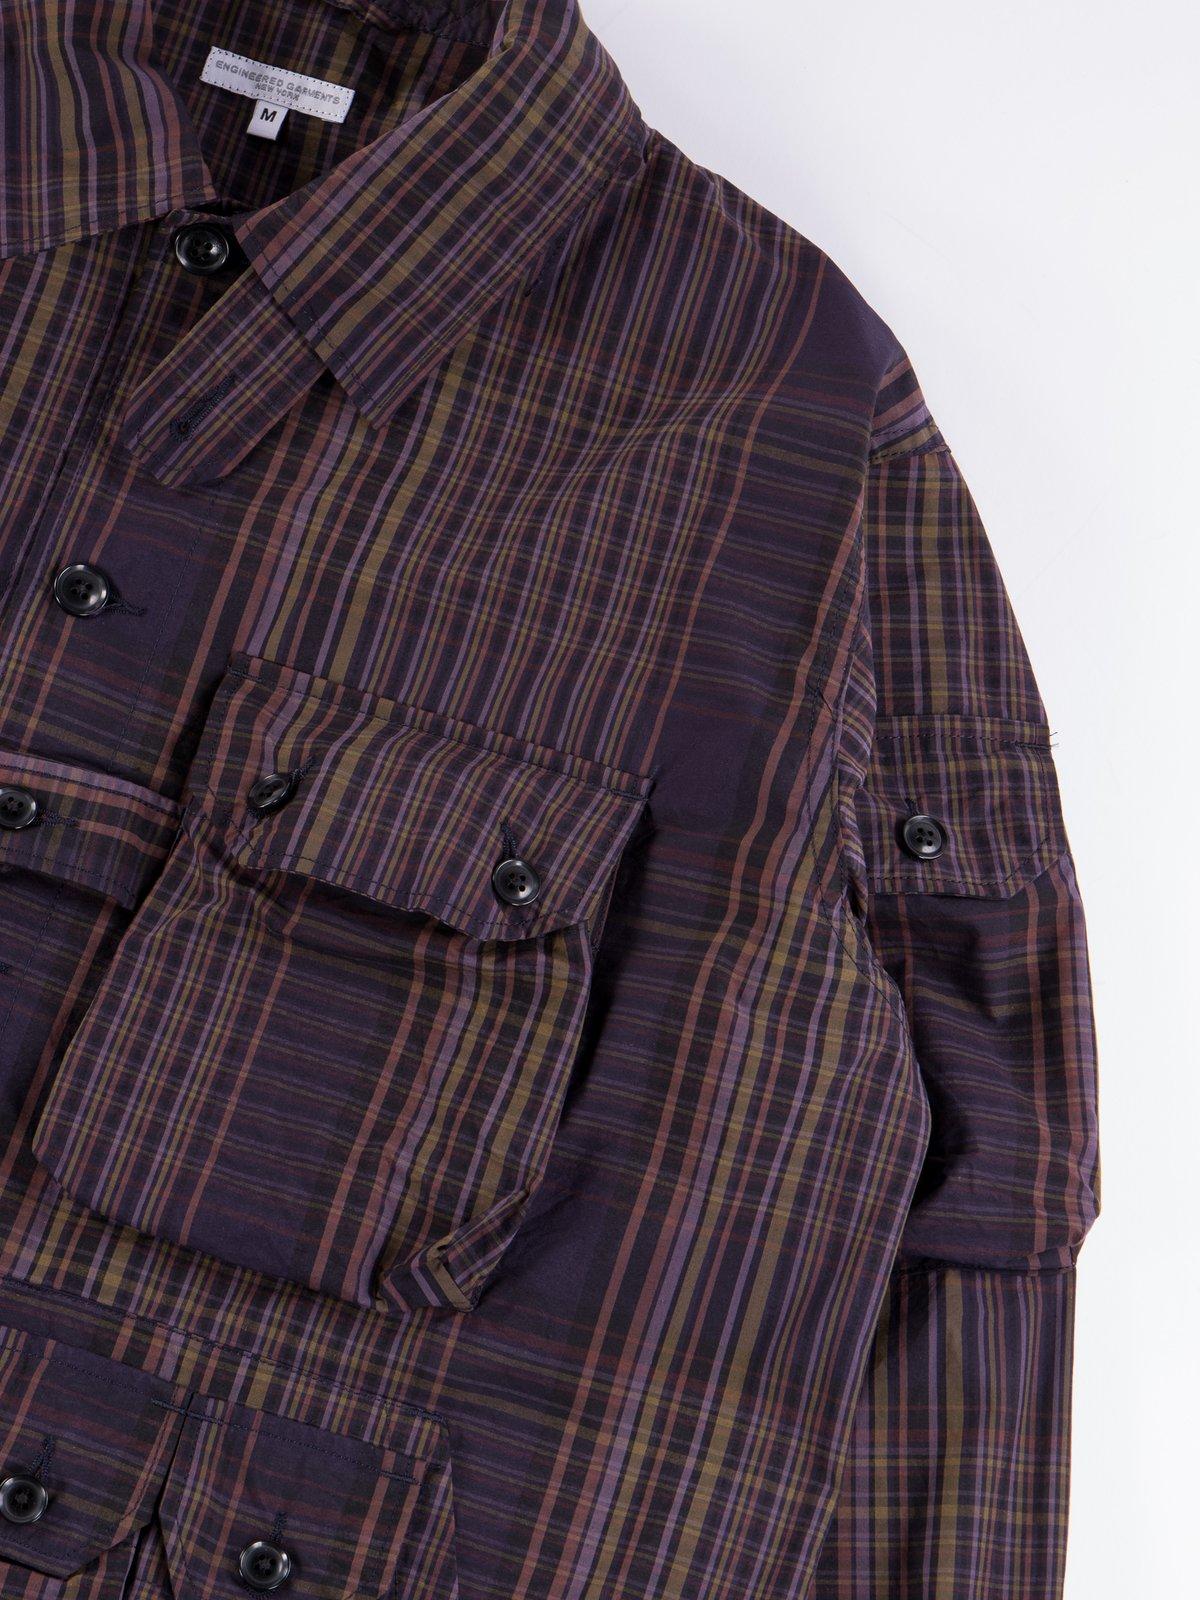 Multi Color Nyco Plaid Explorer Shirt Jacket - Image 4